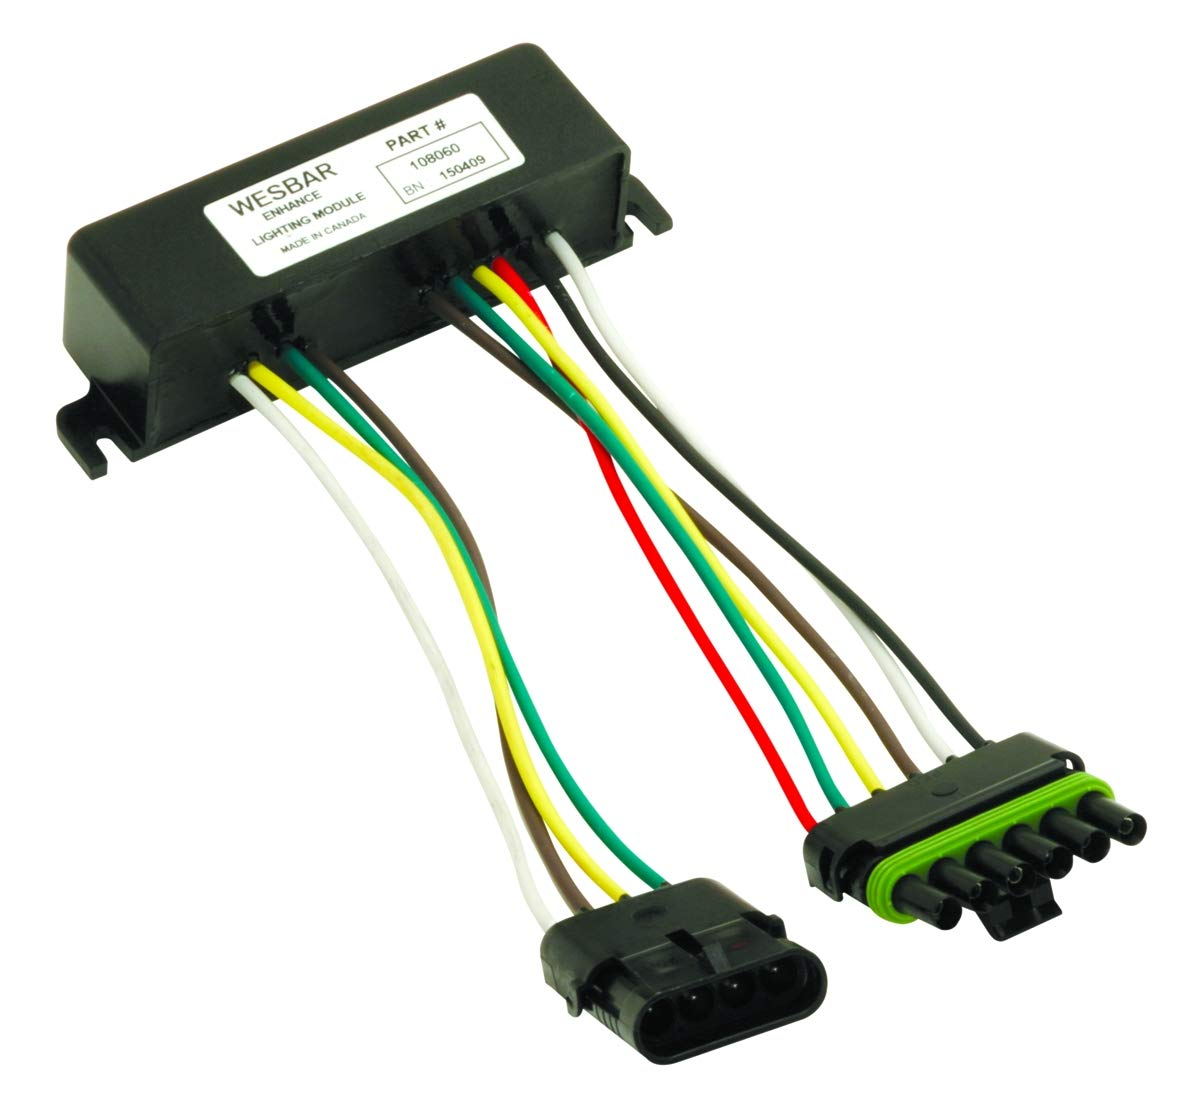 Wesbar Ag Enhanced Lighting Module with Weatherproof Plugs by Wesbar